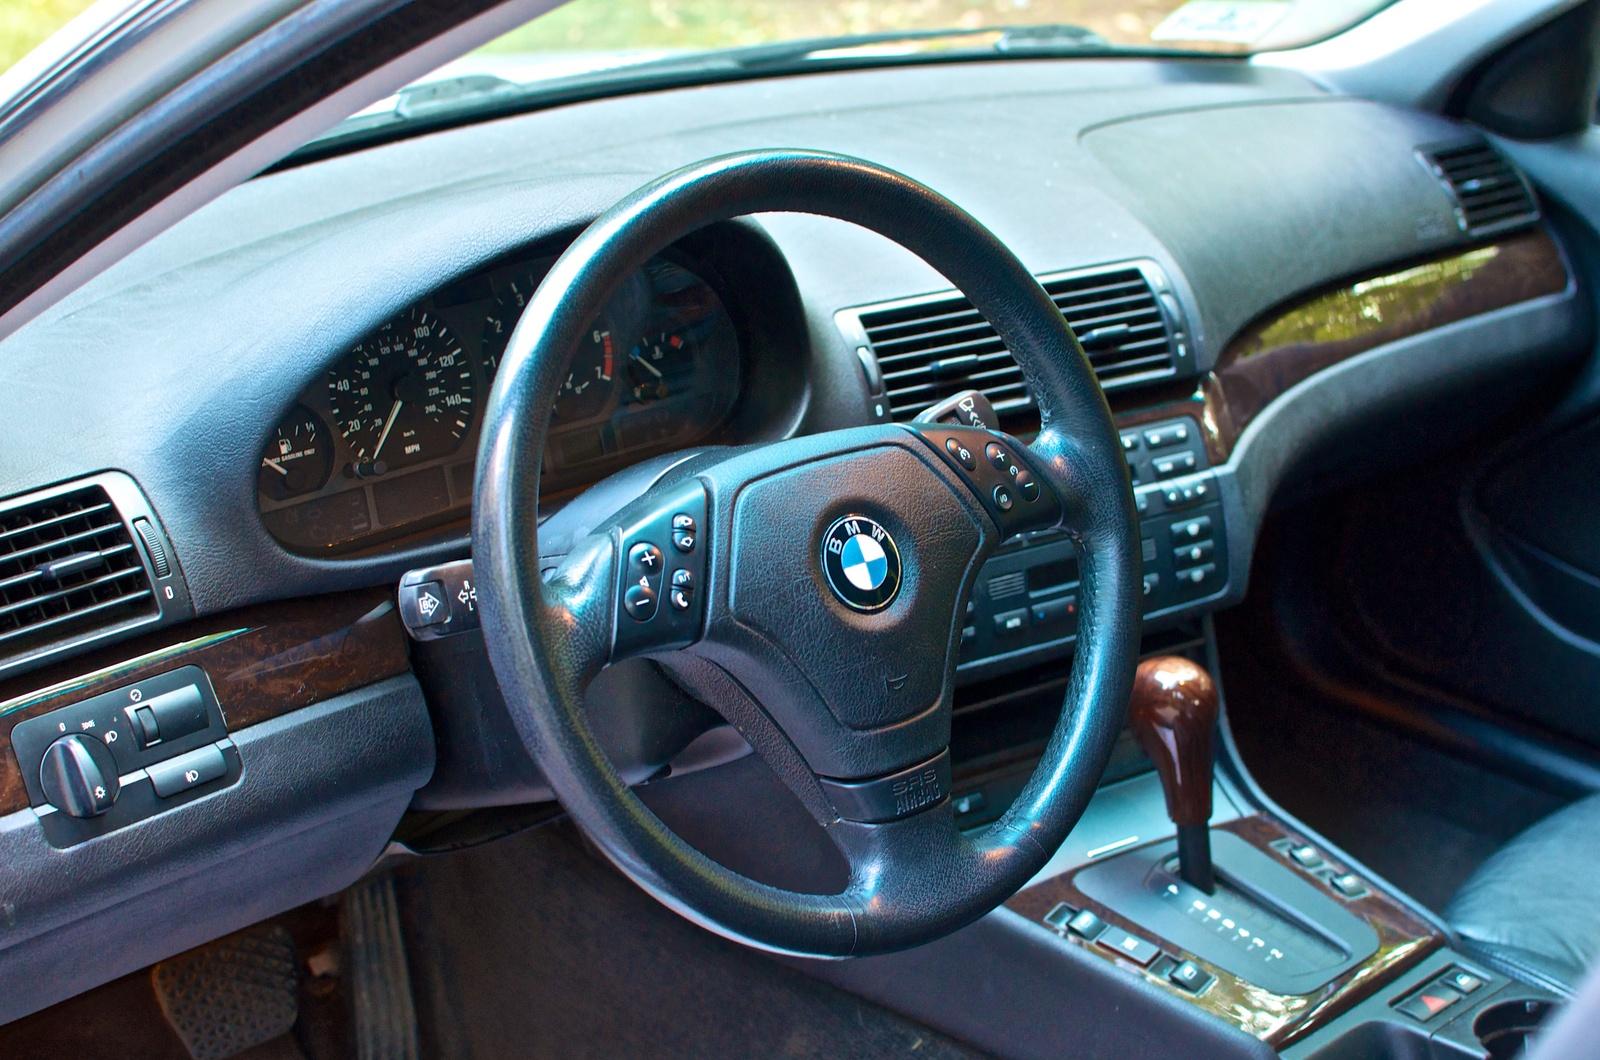 BMW Convertible 99 328i Bmw 1999 Bmw 323i Interior ~ Instainterior.us